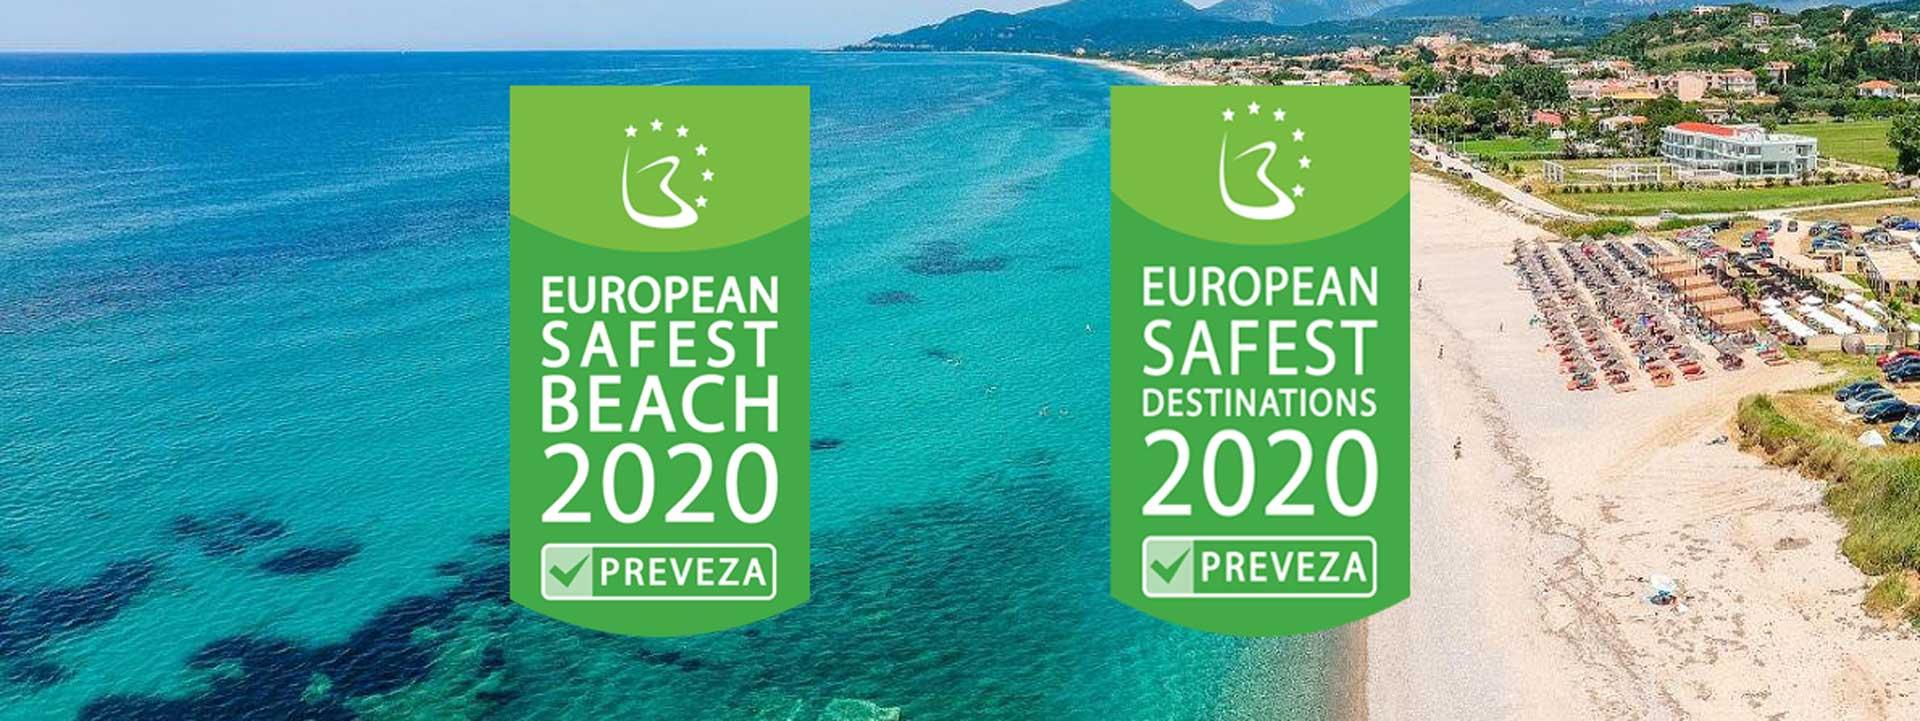 europeansafestbeachdestinationspreveza